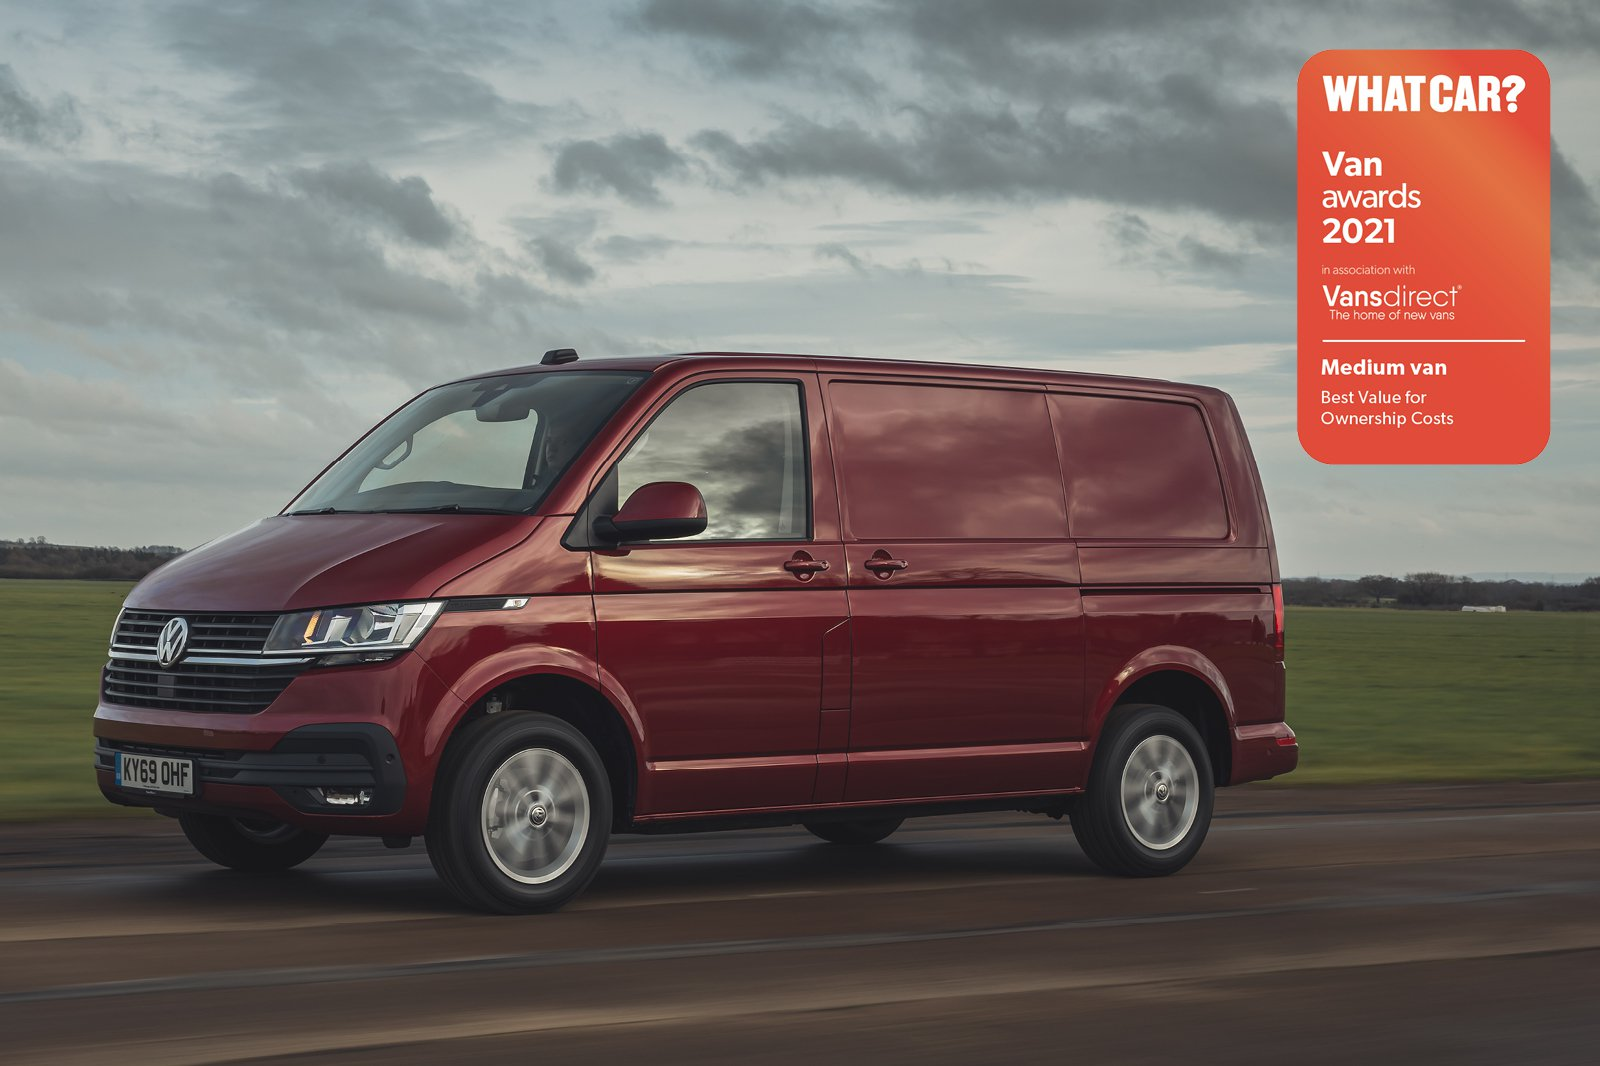 Van Awards 2021 - Medium Van - Best Value for Ownership Costs (new logo)